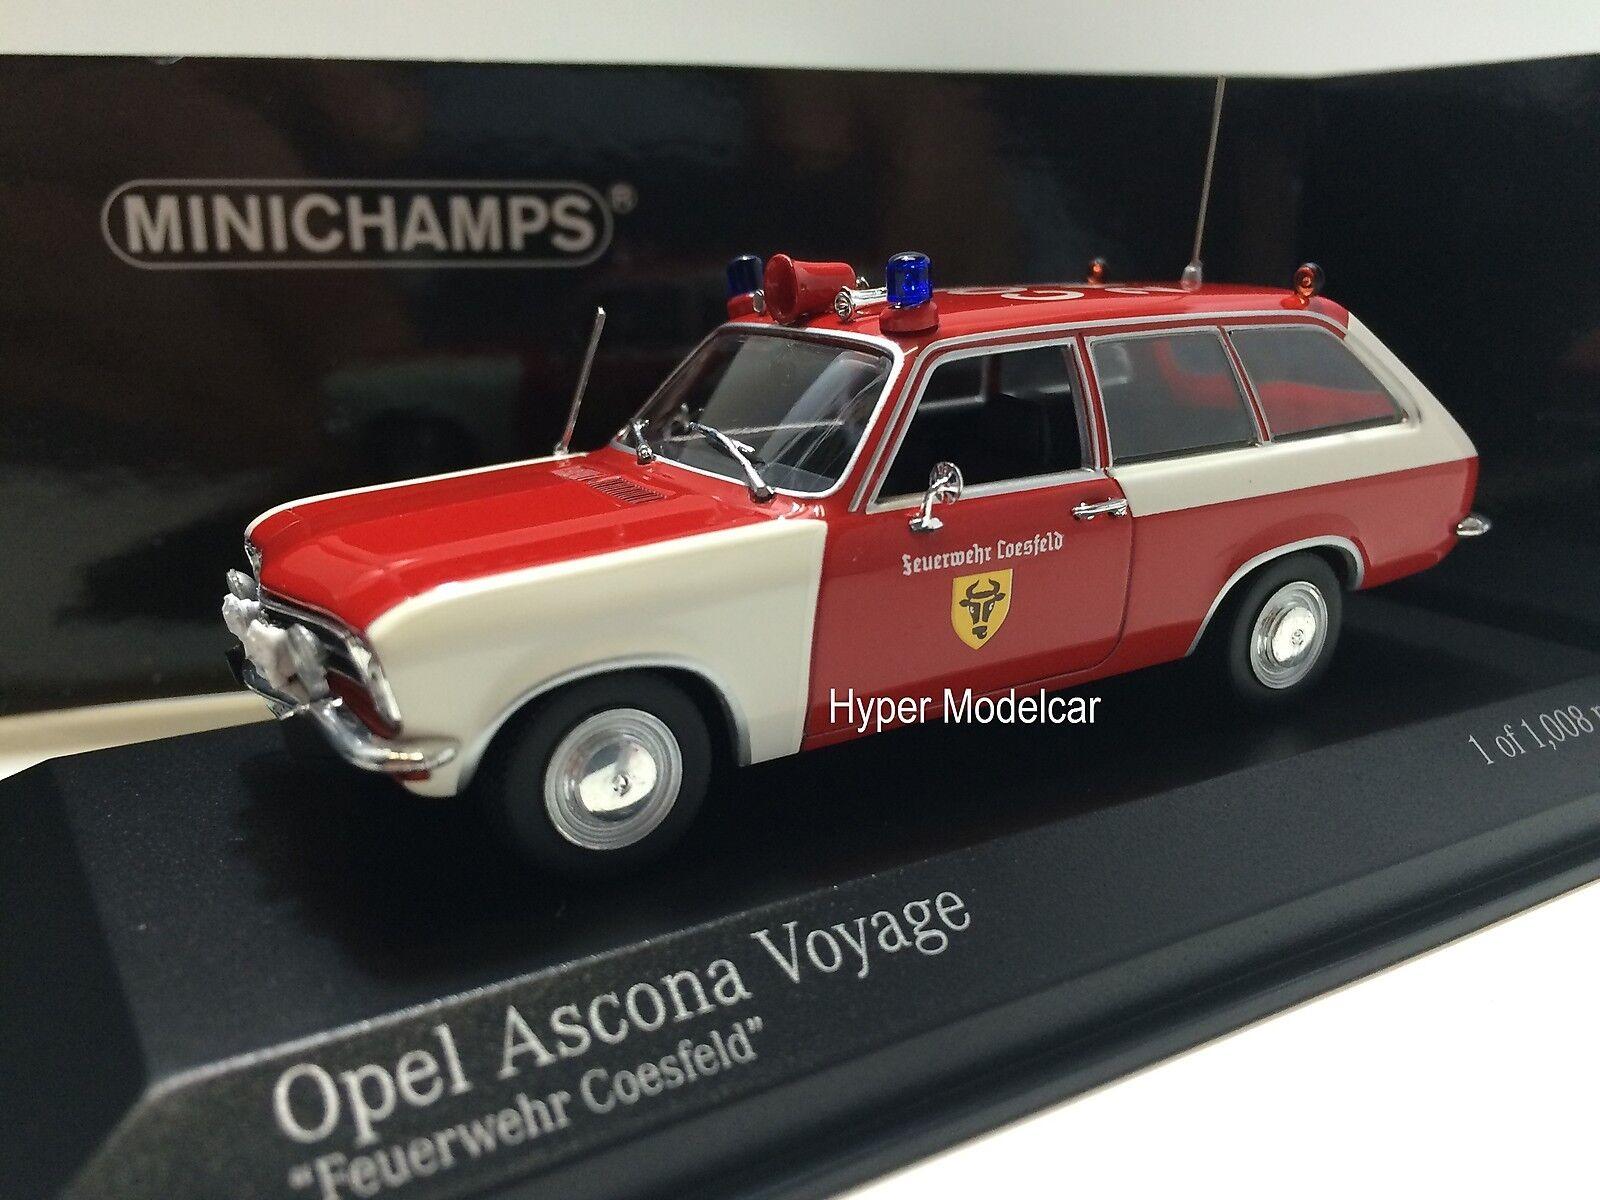 Minichamps 1/43 Opel Ascona Voyage Station Wagon Fire Engine 1970 Art.400045890